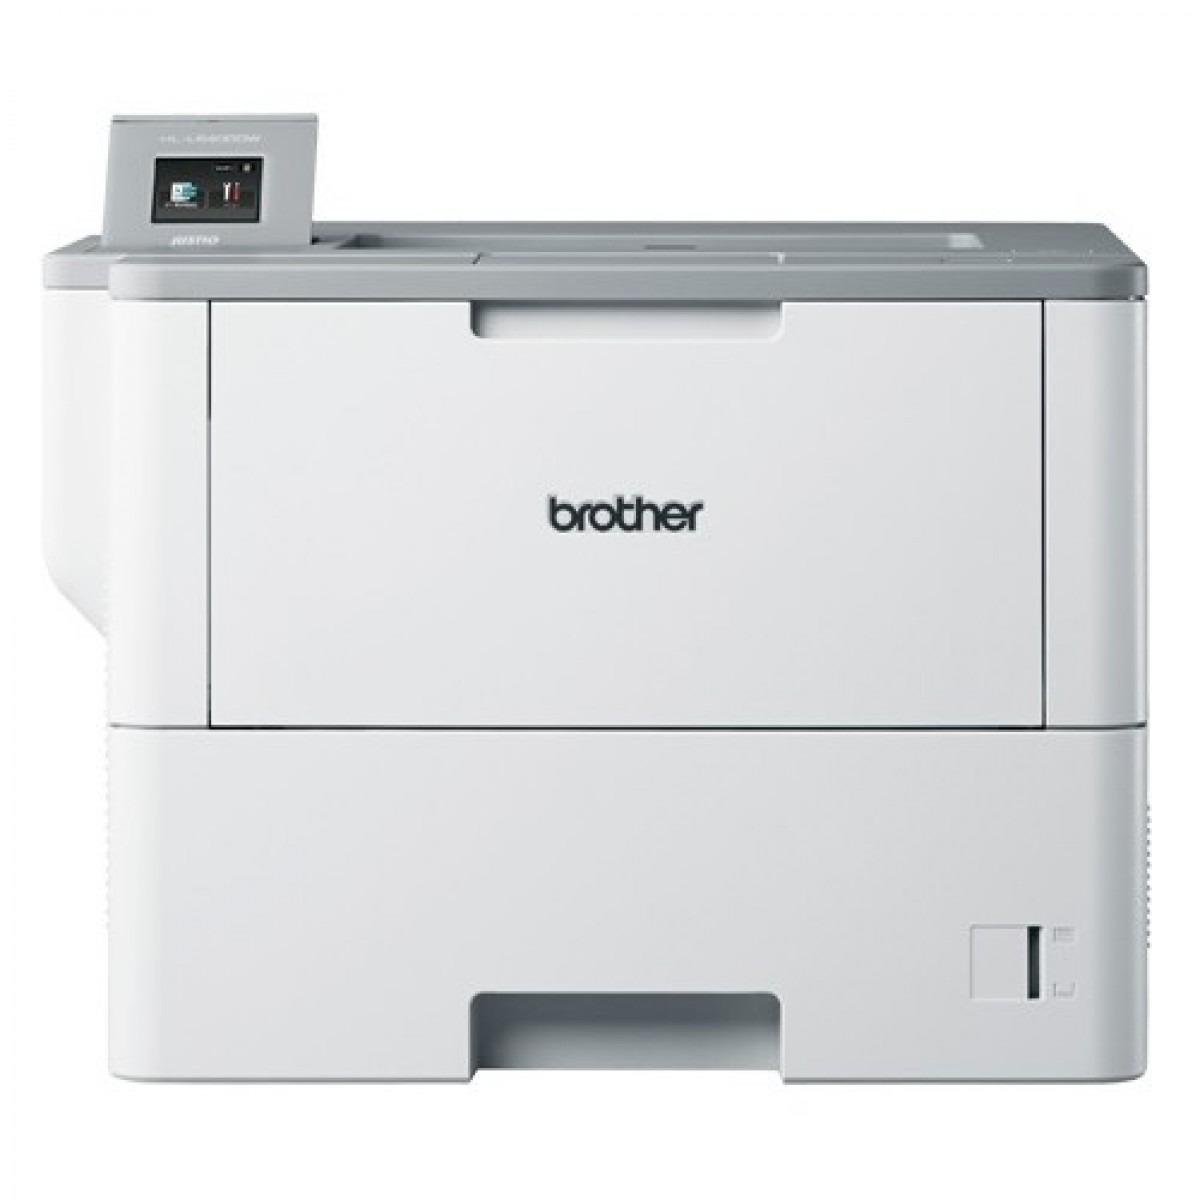 Impresora brother laser monocromo hll6400dw - a4 - 50ppm - 512mb - wifi - bandeja estandar 520 hojas con multiproposito 50 hojas